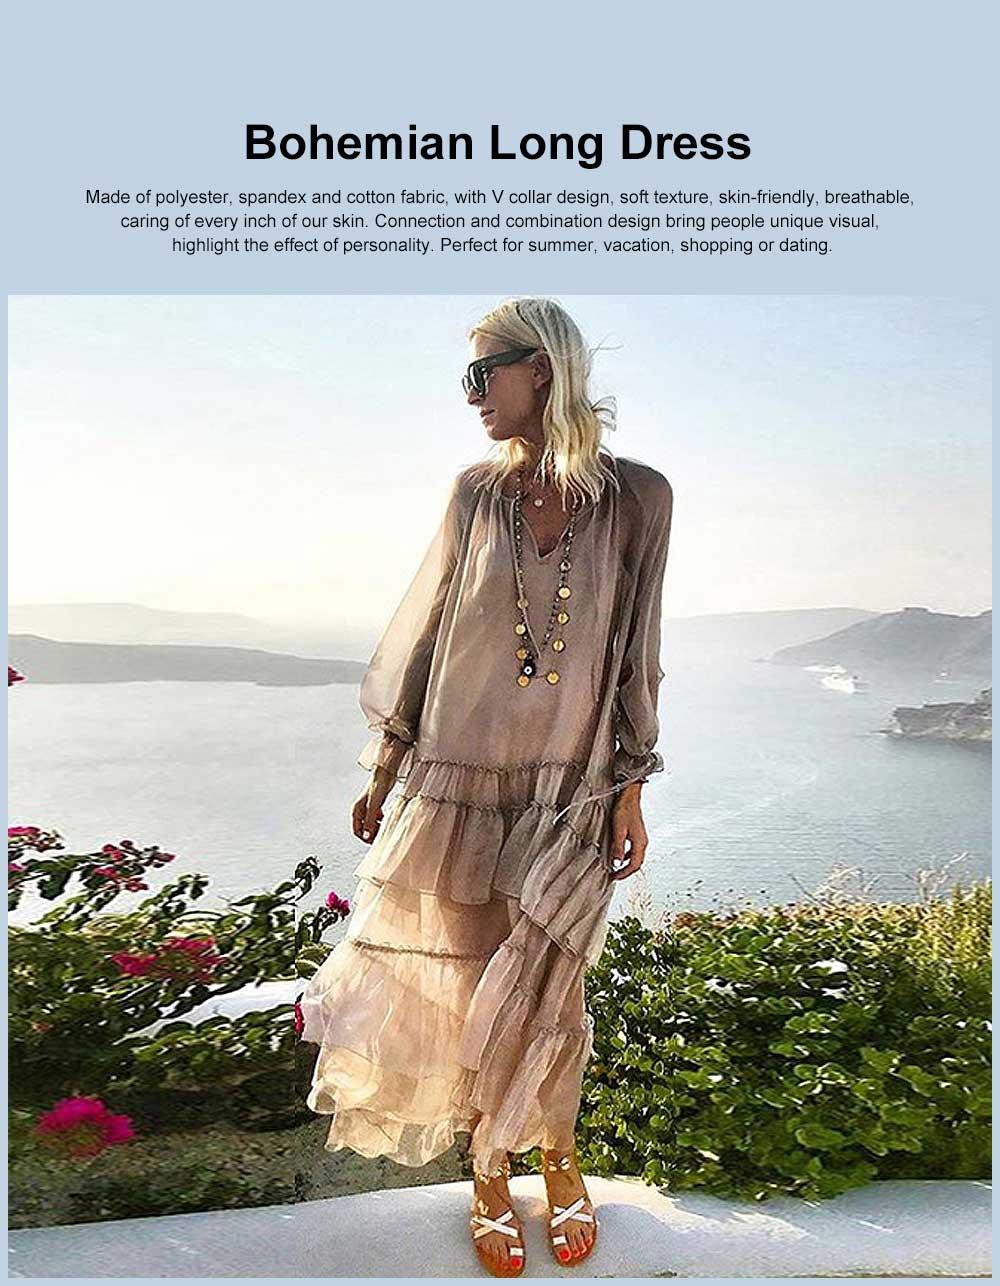 V-neck Ruffled Long-sleeve Resort Boho Dress for Vocation, Bohemian Long Dress, Lantern Sleeve Lotus Leaf Dress Hem Combination Design for Summer Autumn Dress 2019 0